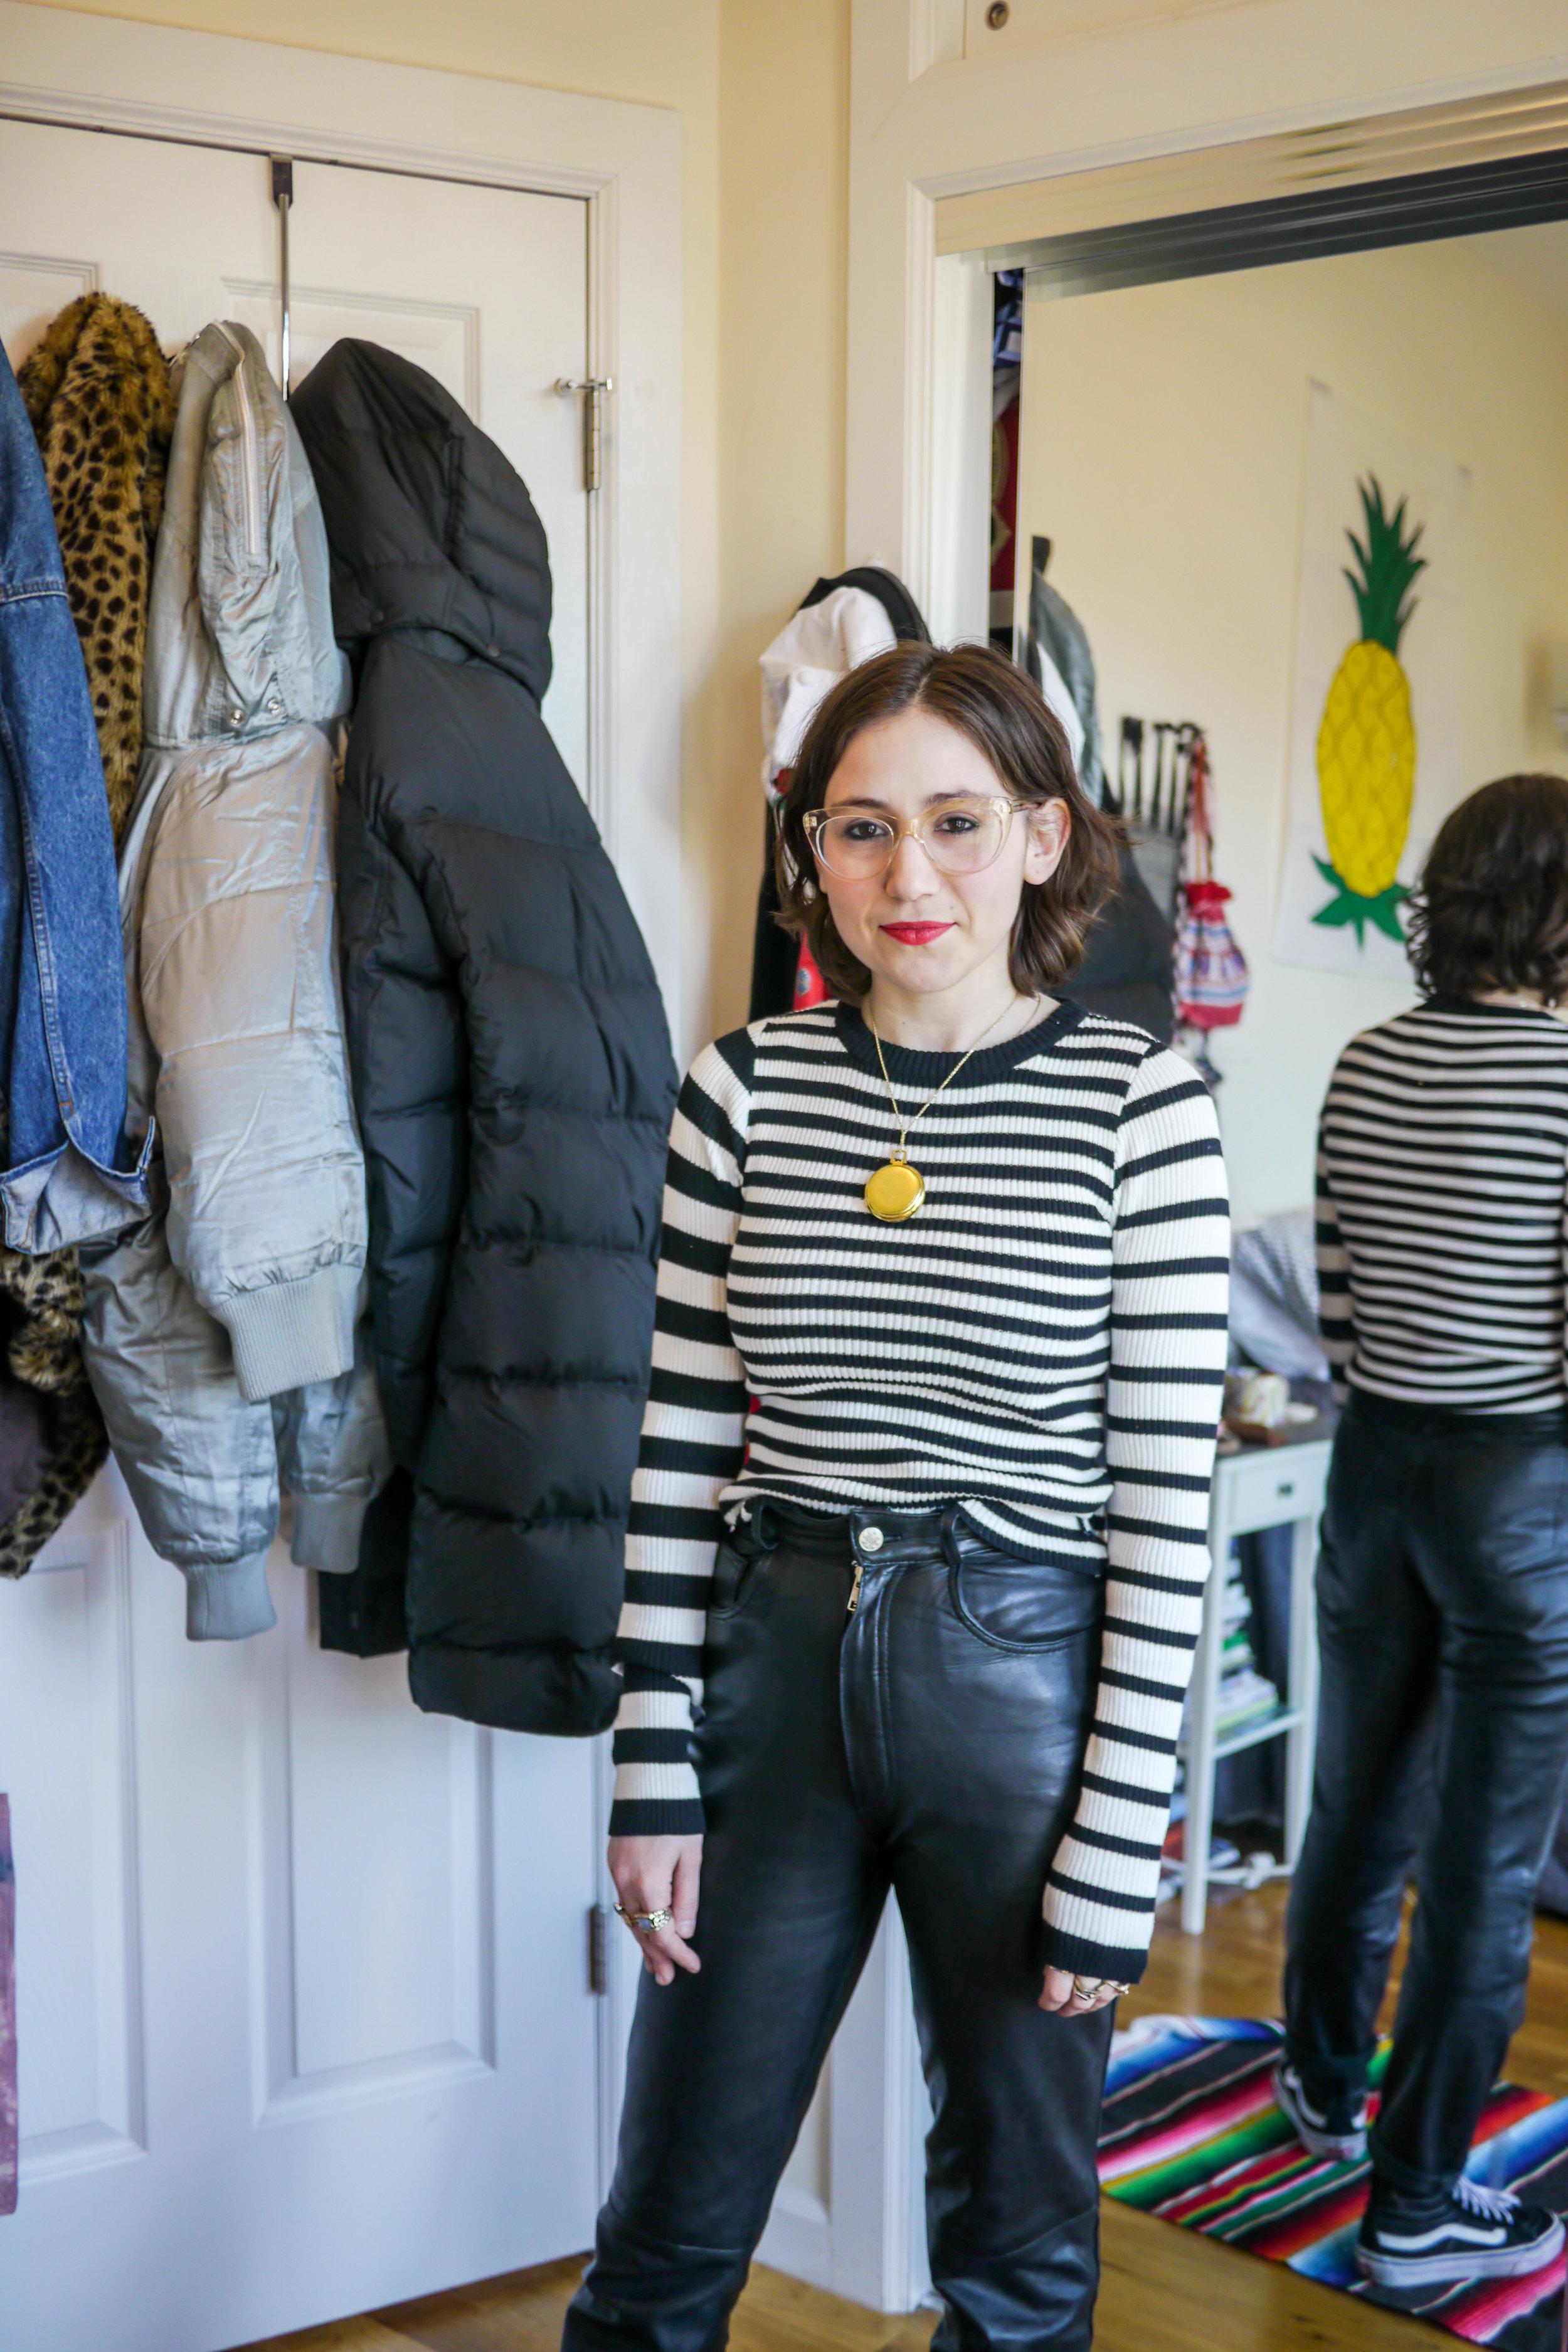 Outfit Details: Top, UNIF ; Pants, Vintage ;    Glasses, Warby Parker